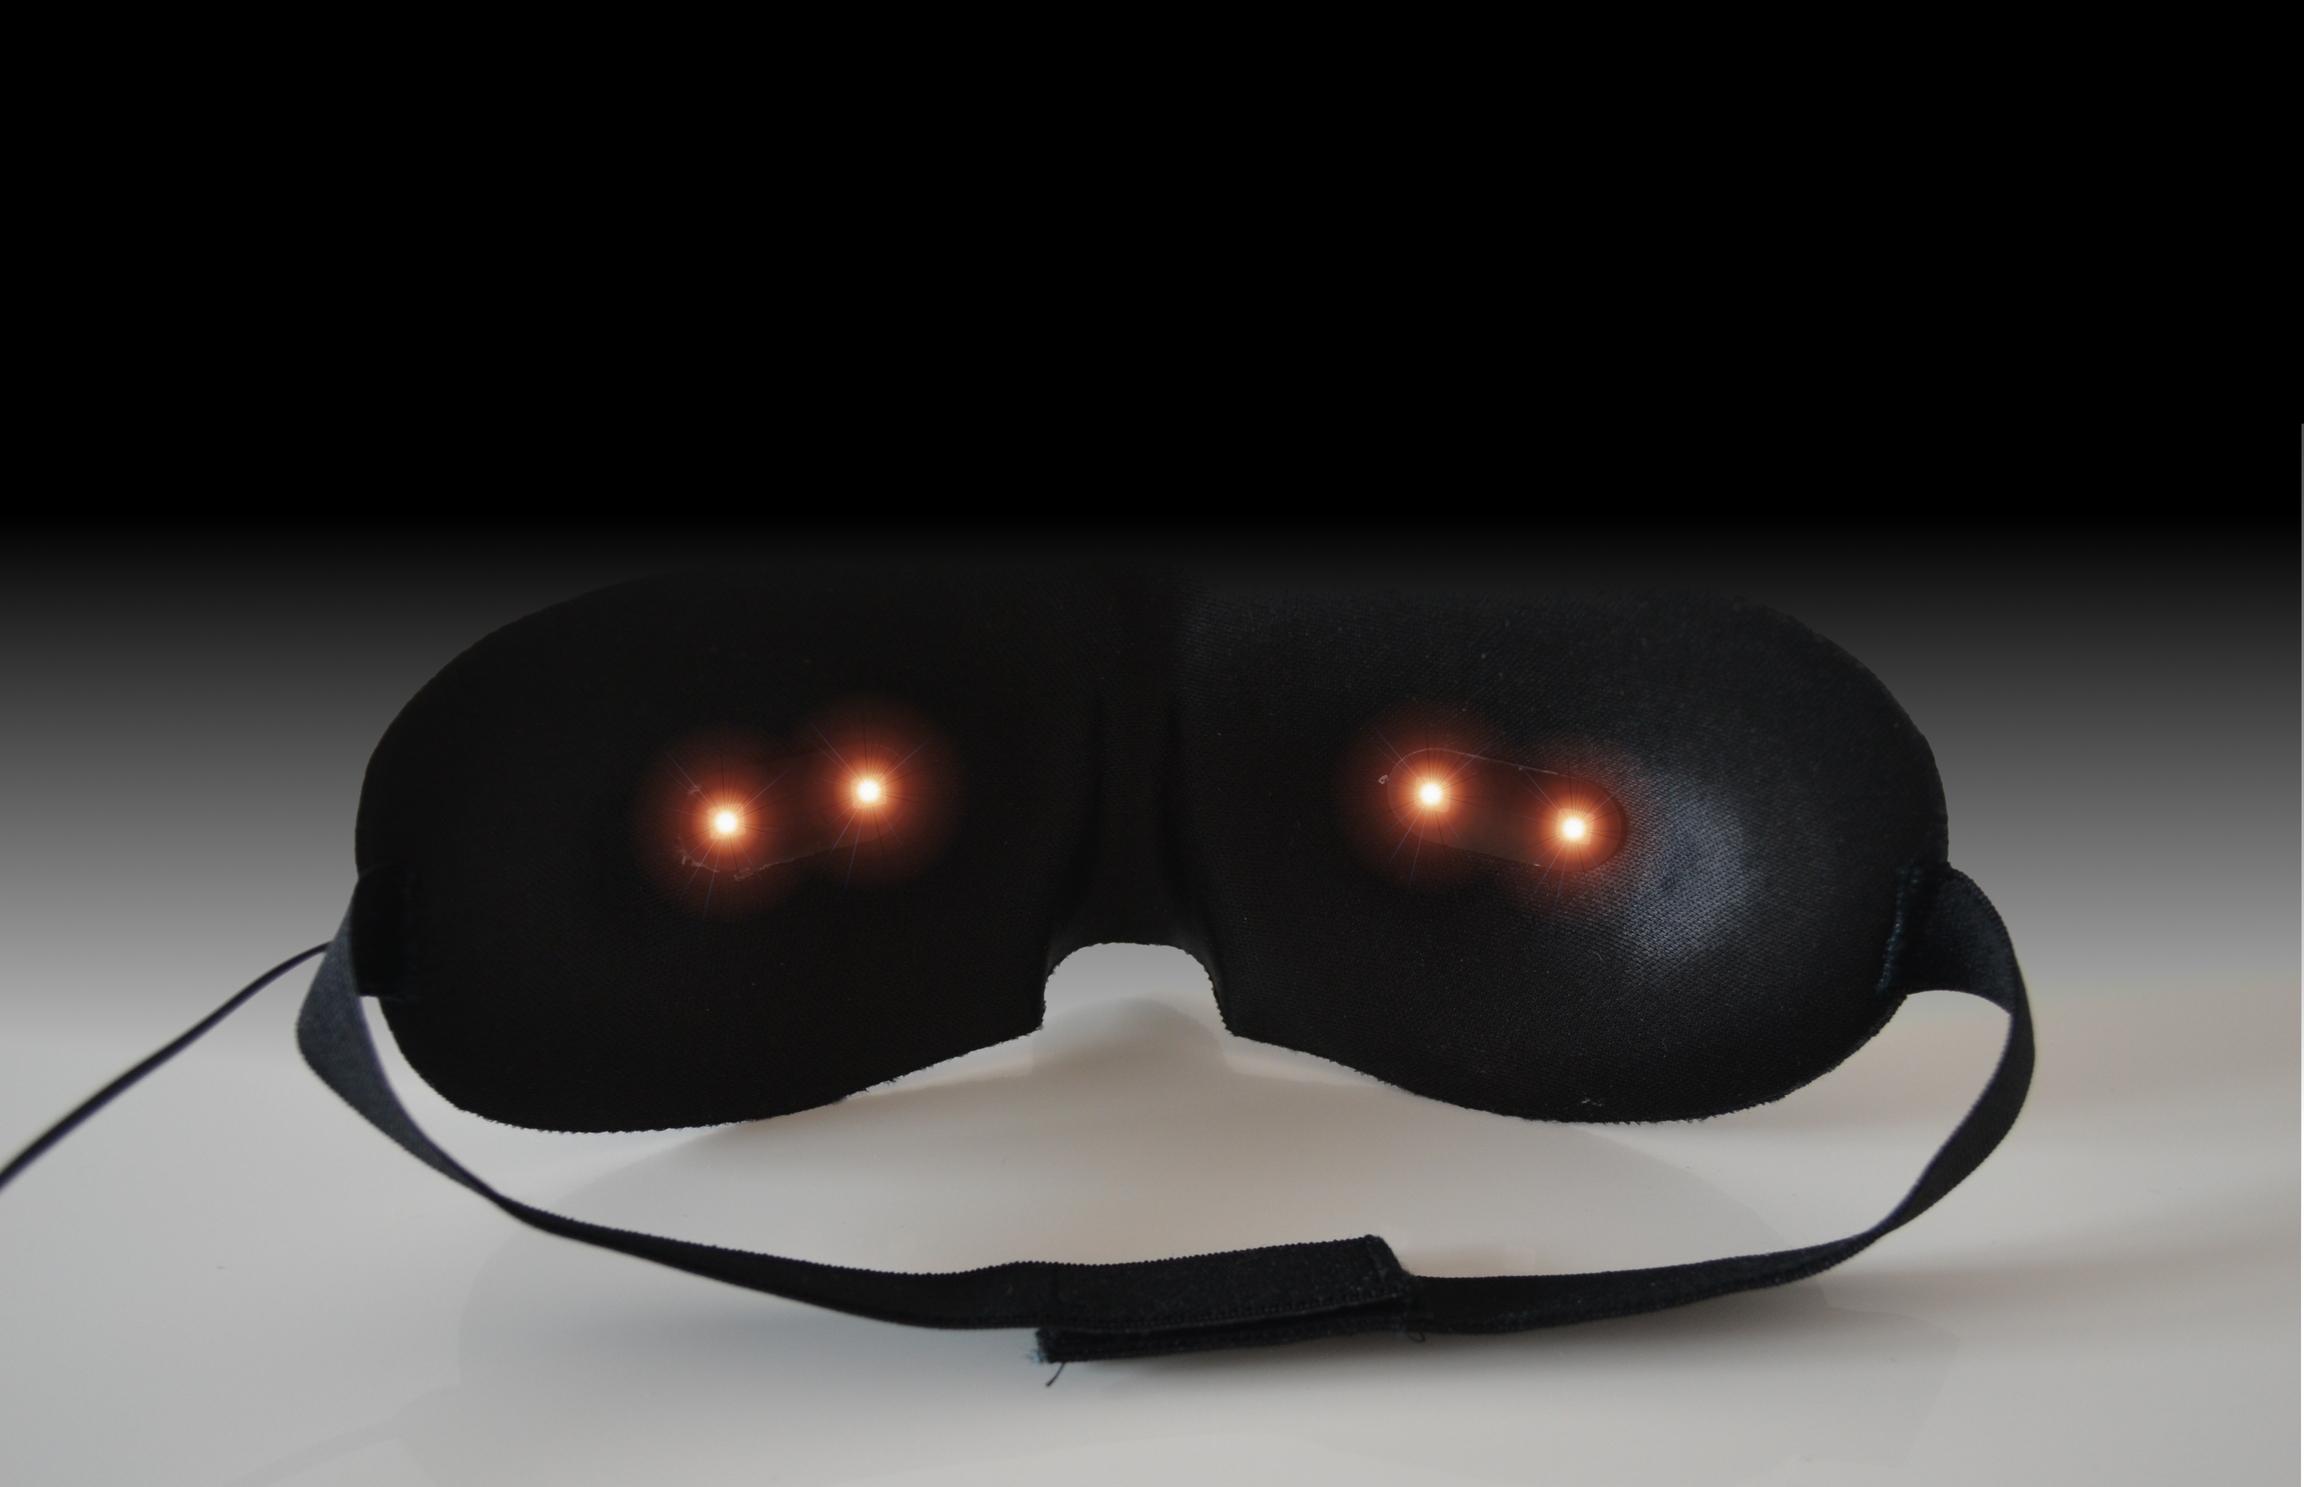 Sleep Mask Sleep As Android